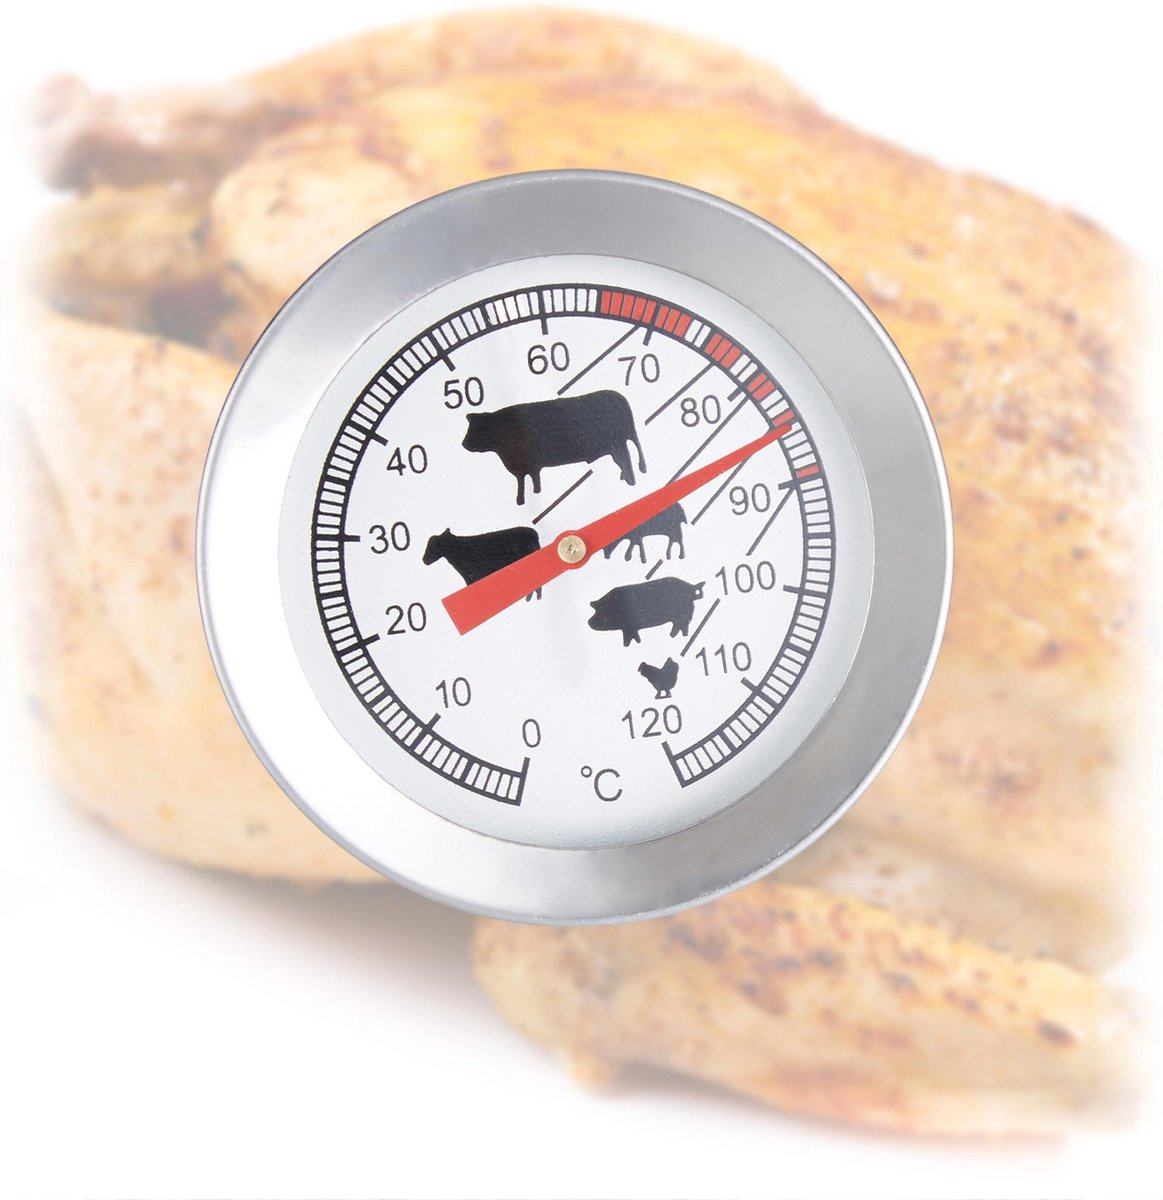 relaxdays vleesthermometer analoog - bbq thermometer rvs - braadthermometer 20 cm barbecue